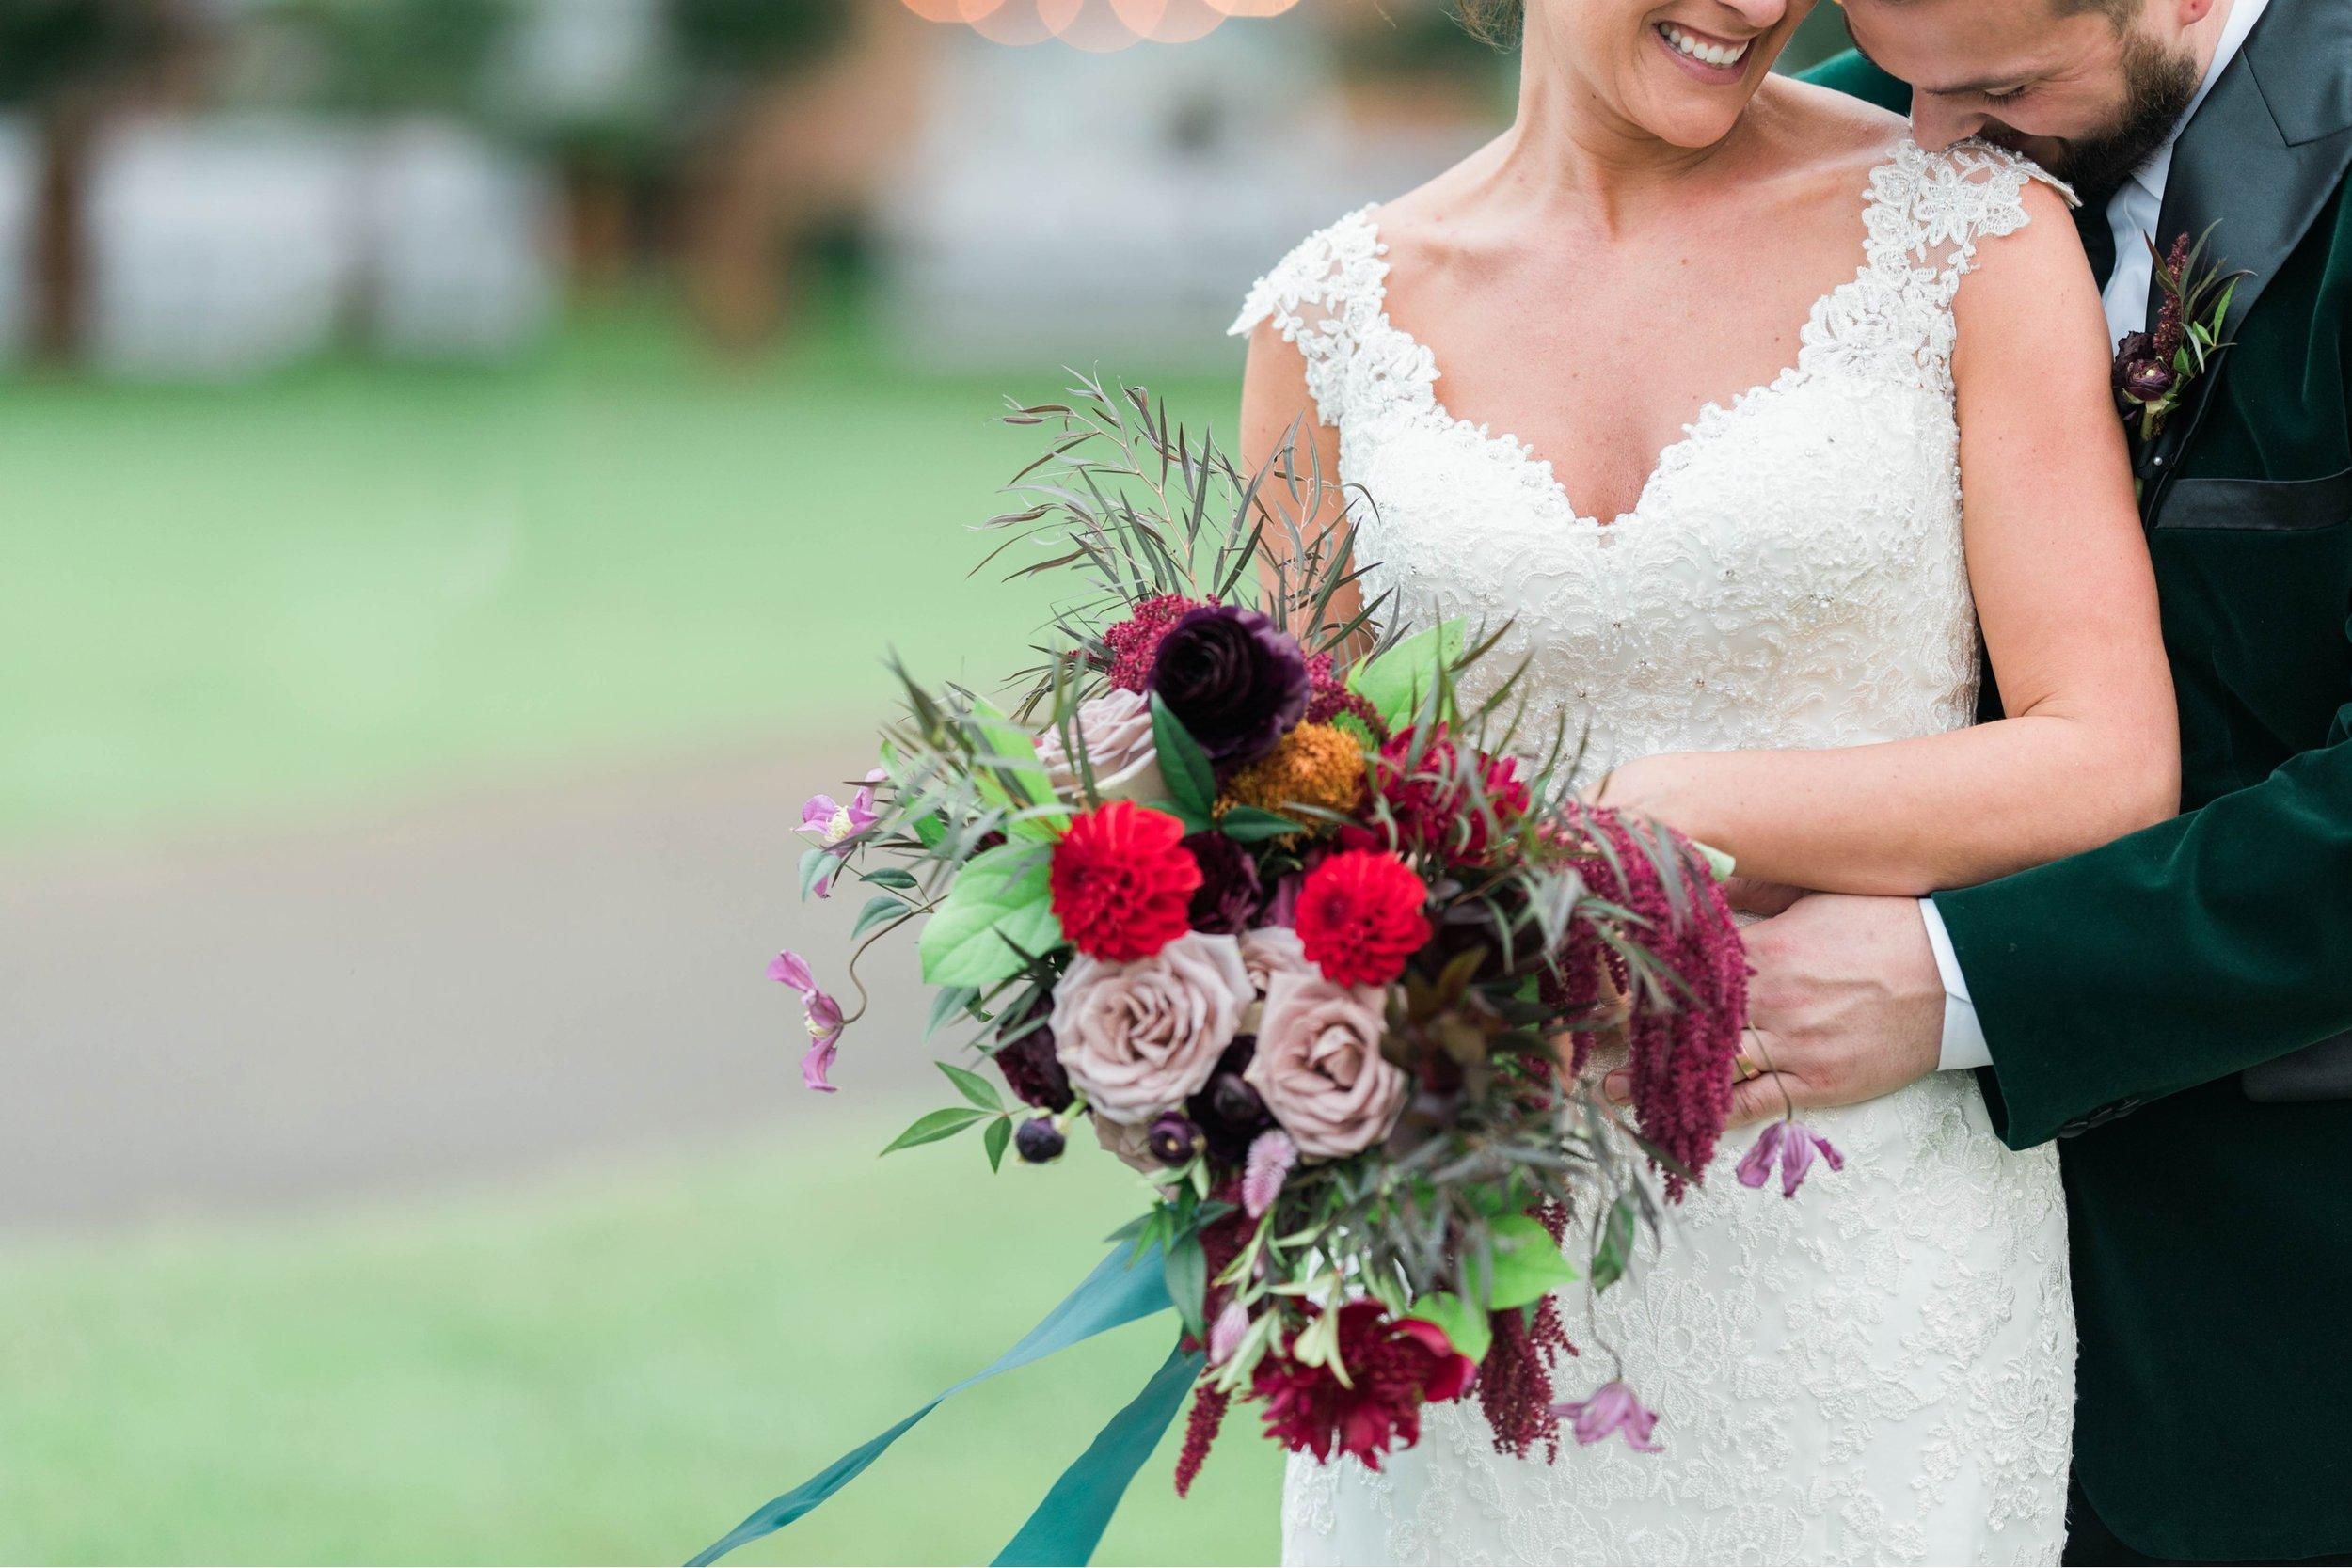 Gordan+Lauren_BoonsboroCountryClubWedding_Virginiaweddingphotographer_LynchburgVi 31.jpg